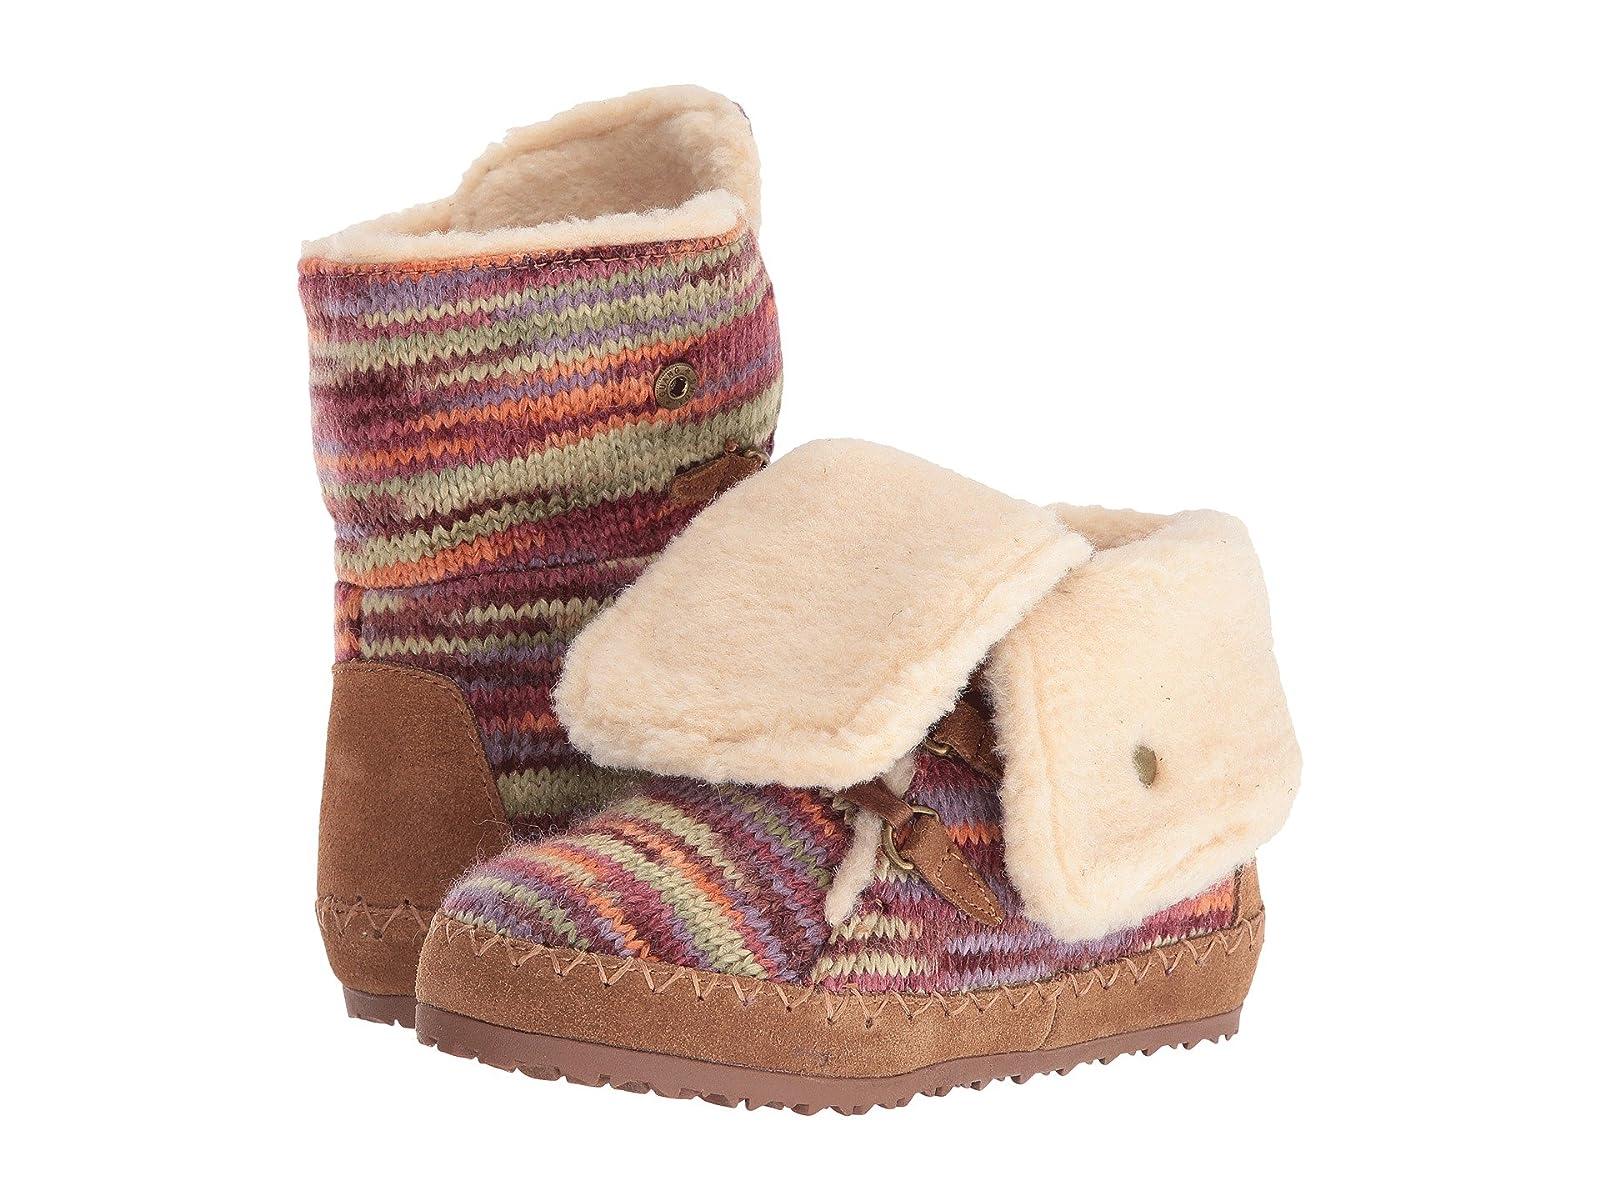 Bearpaw Kids Suzy (Little Kid/Big Kid)Cheap and distinctive eye-catching shoes